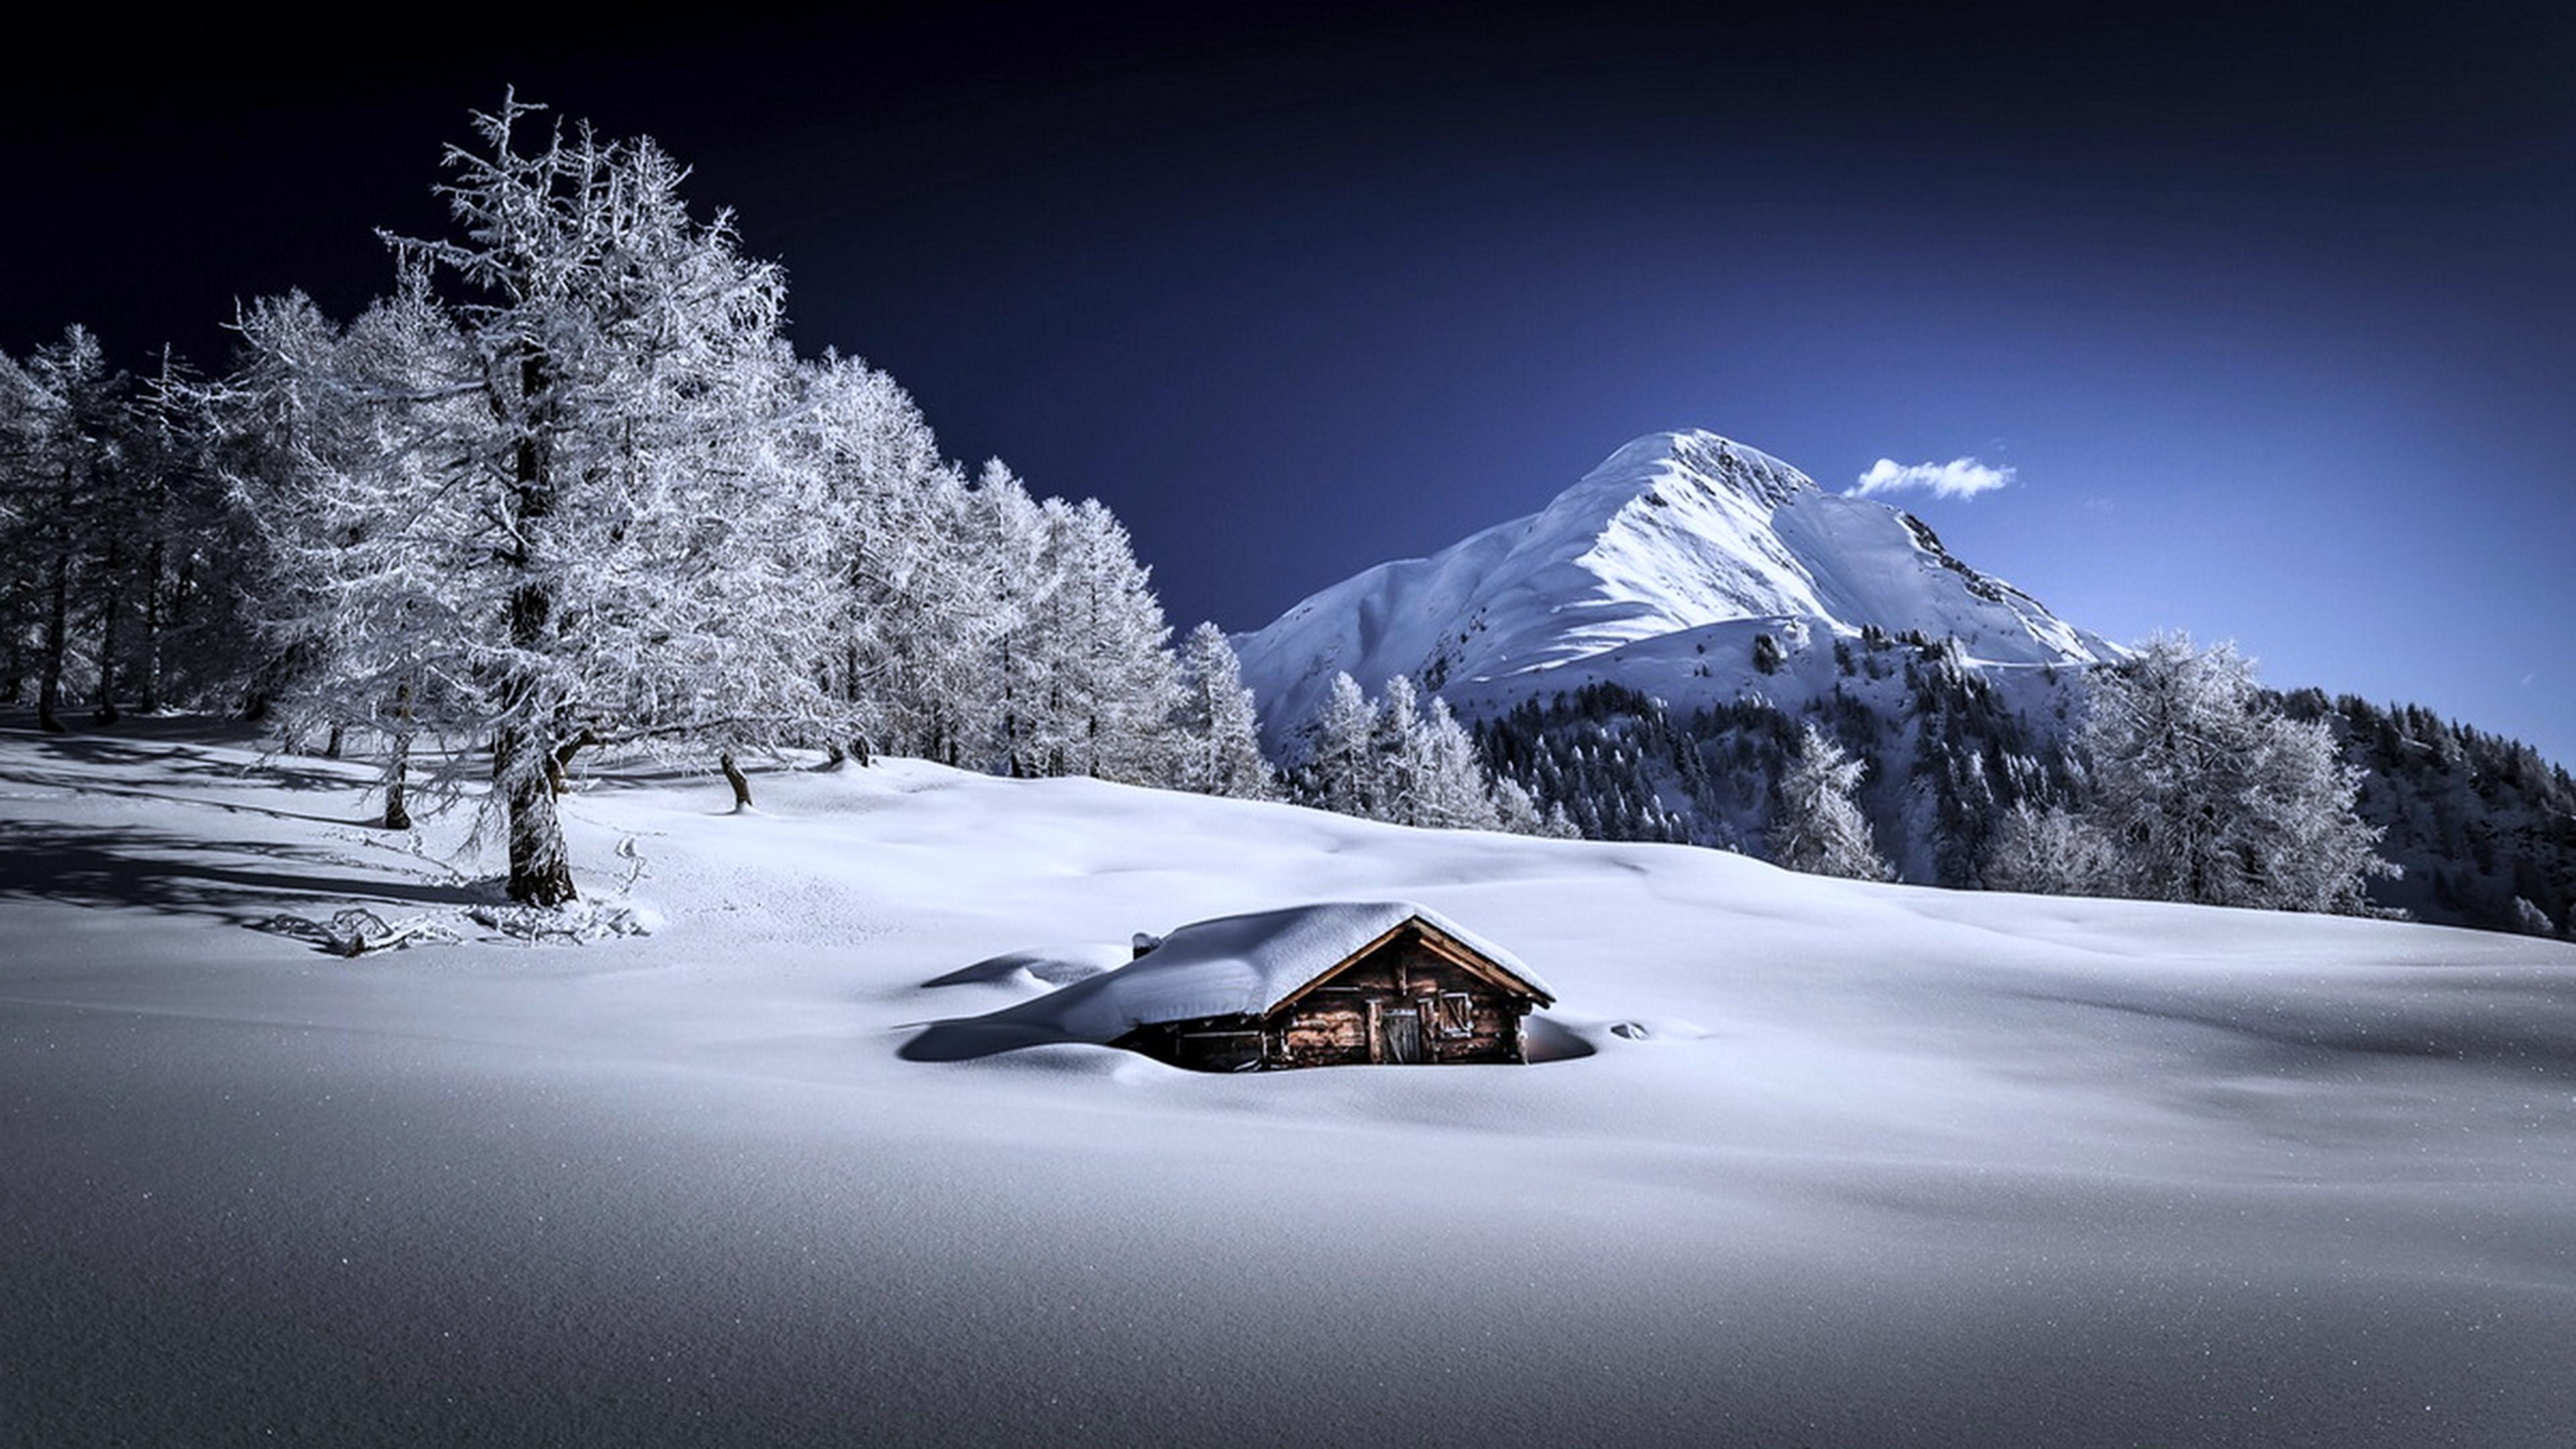 Frozen Winter 4K Wallpaper [3840x2160]